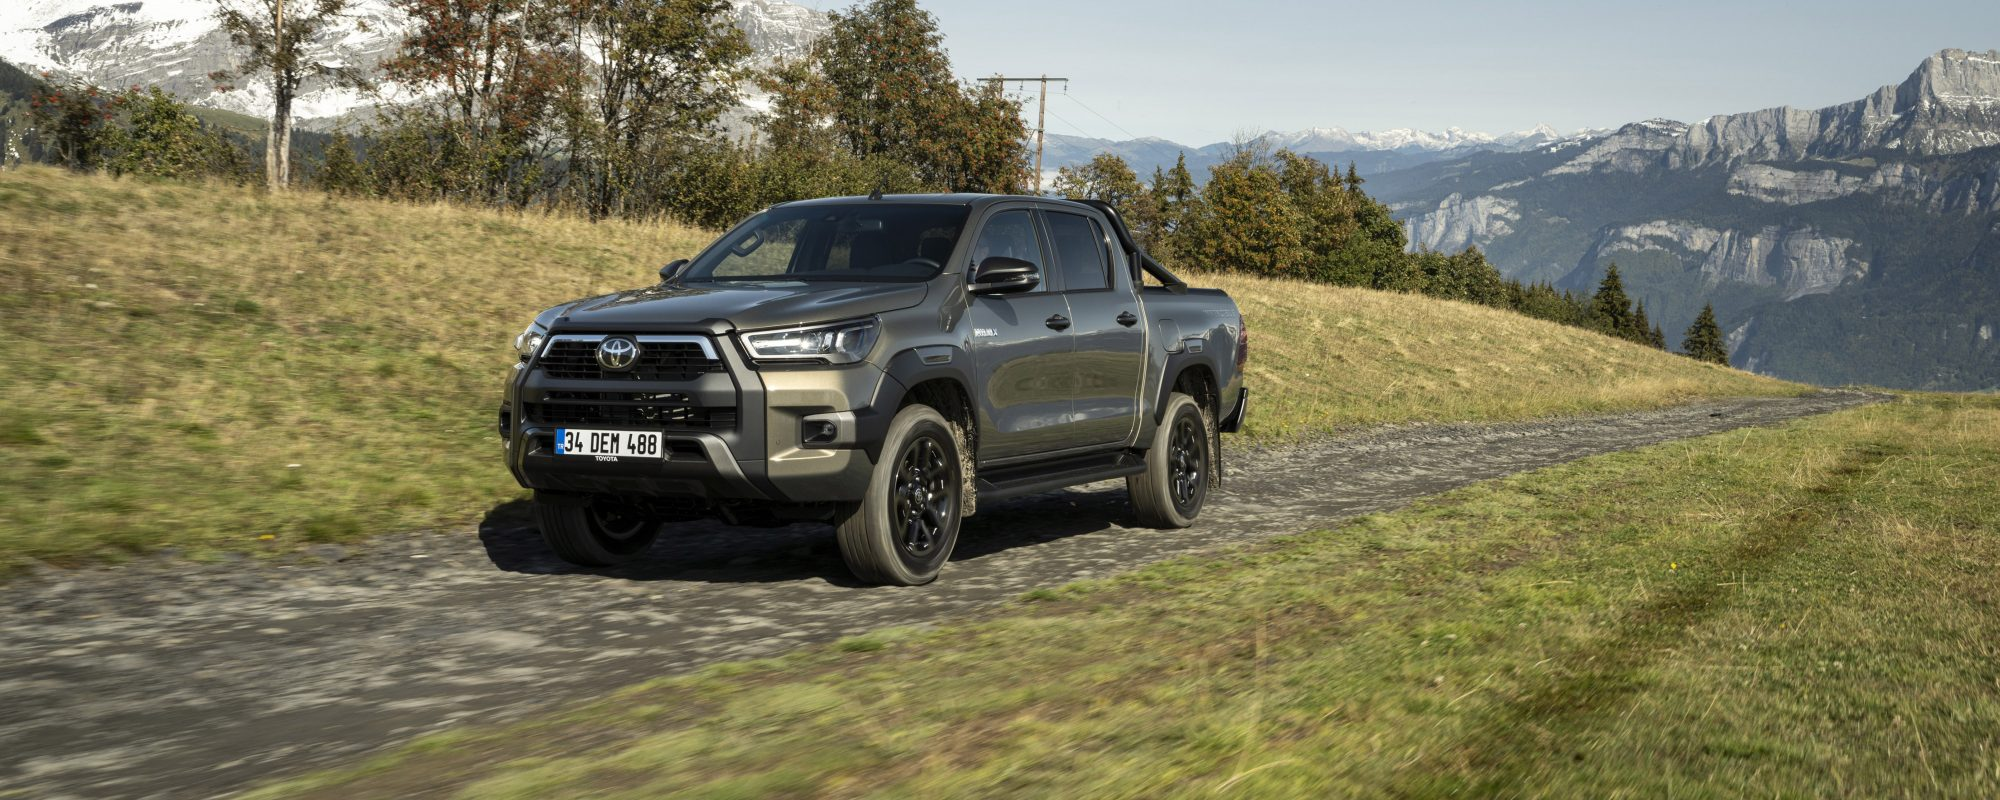 Vernieuwde Toyota Hilux: meer power, verbeterde prestaties on- en offroad